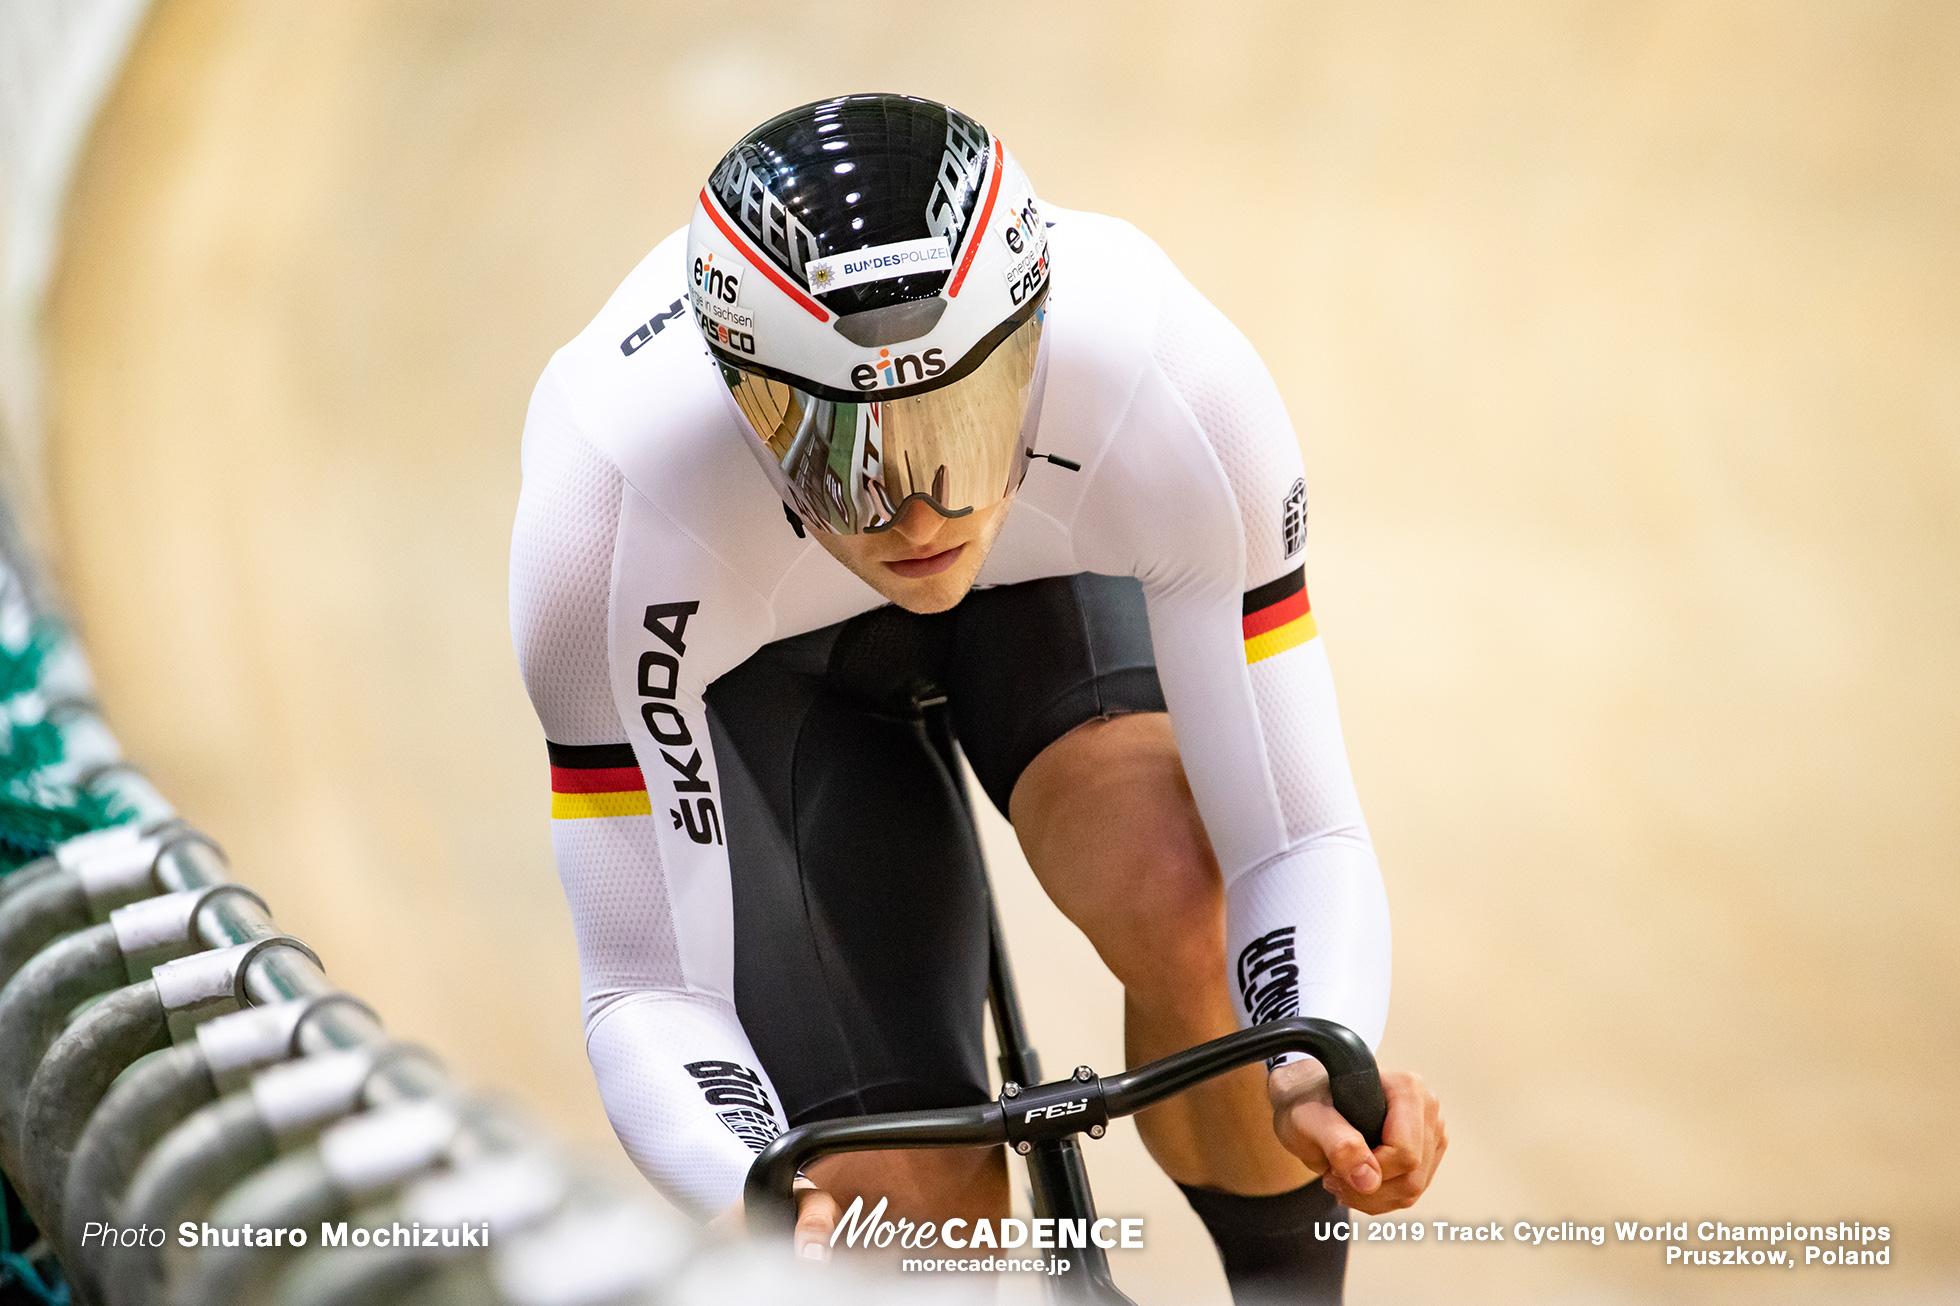 Men's Sprint Qualifying / 2019 Track Cycling World Championships Pruszków, Poland